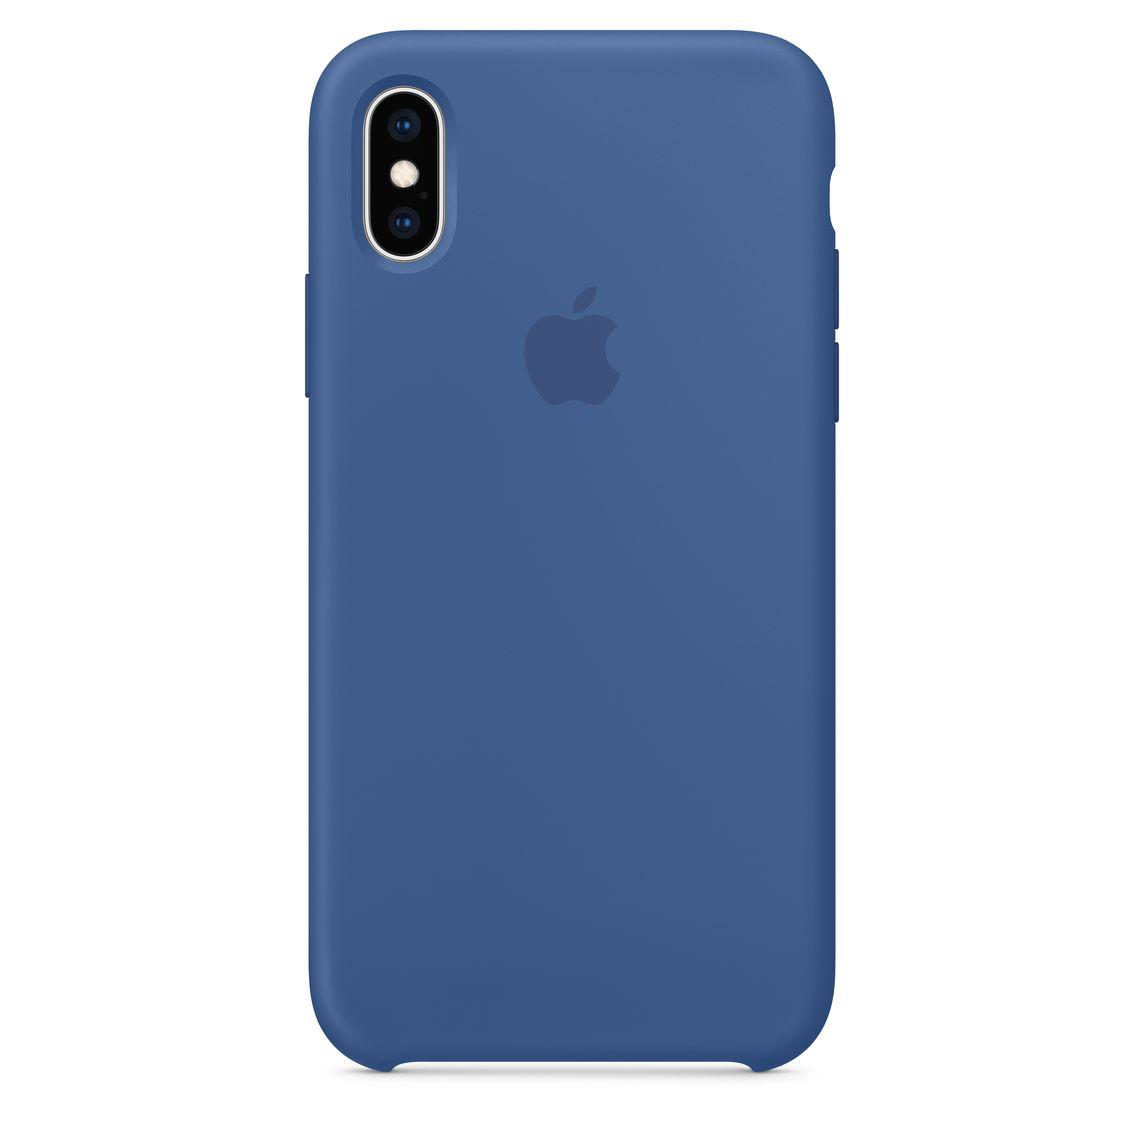 Xs ケース iphone